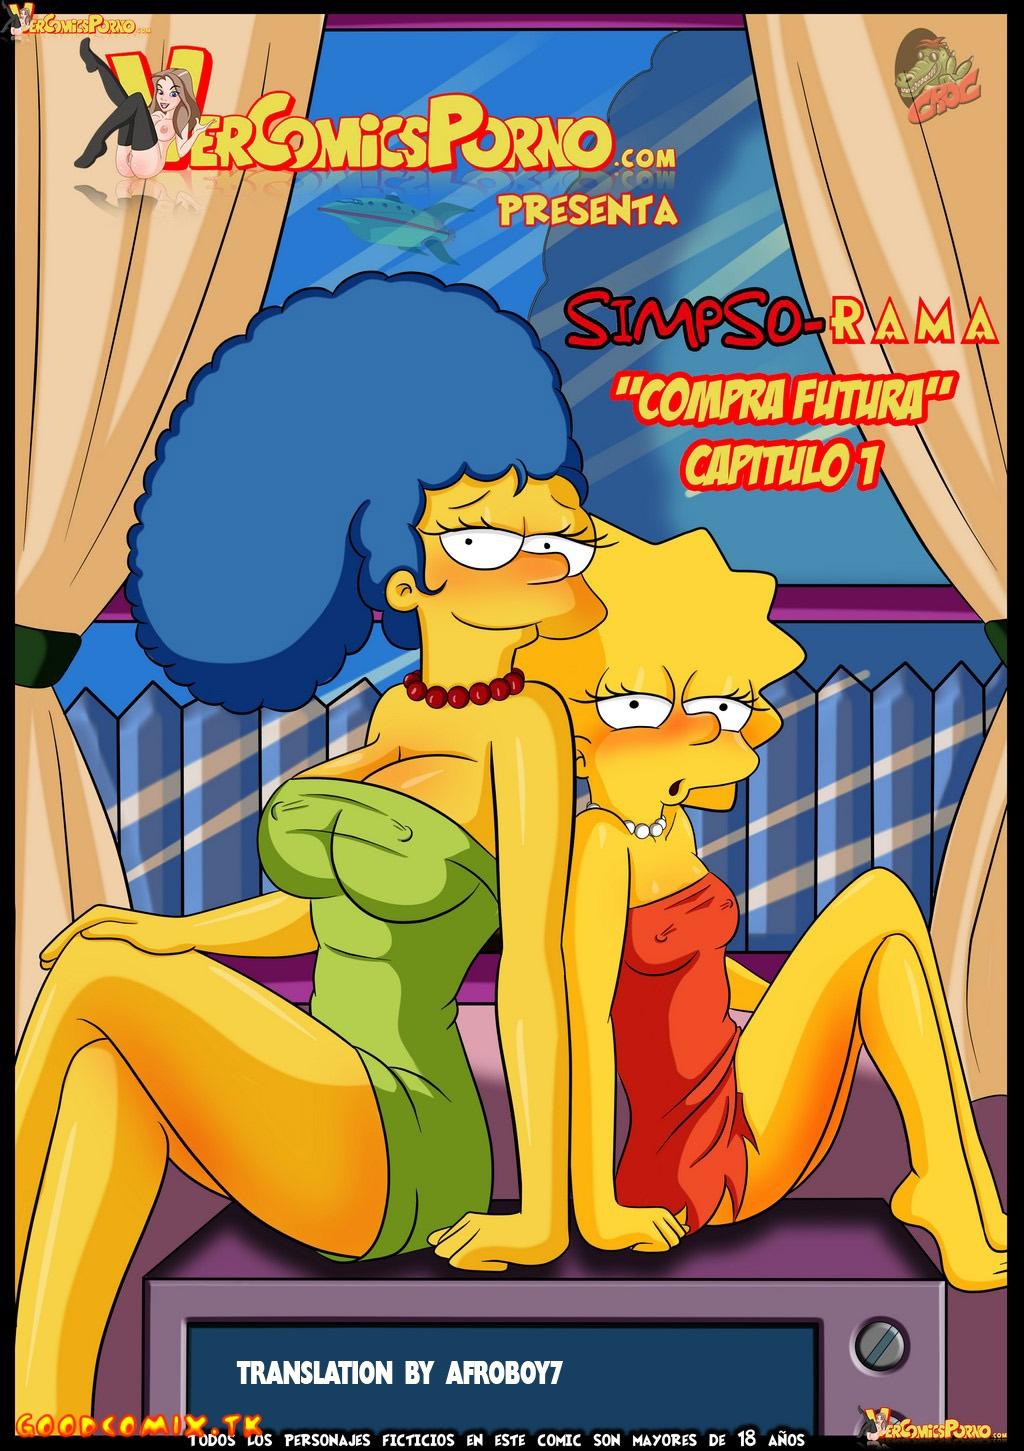 Goodcomix.tk The Simpsons - [Croc] - SimpsoRama - Simpso-Rama - Capitulo 1 Compra Futura 1